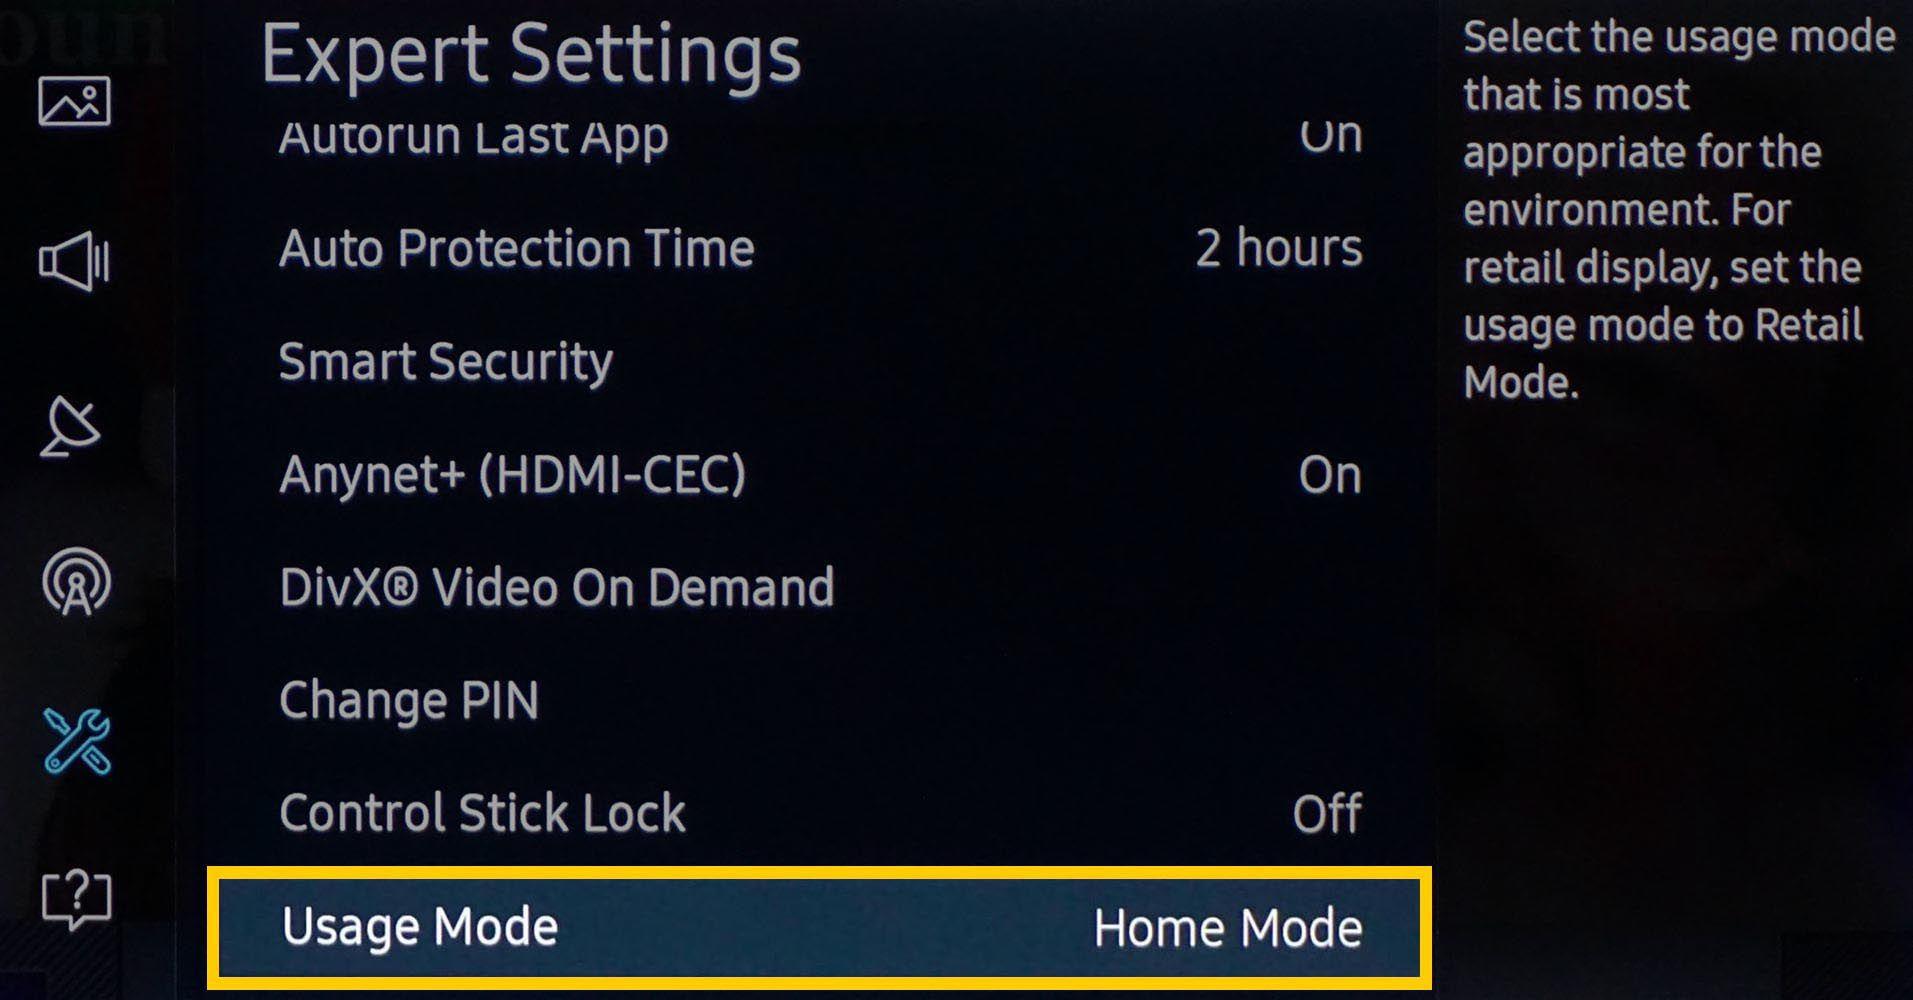 Samsung 4K UHD TV Home Use Mode